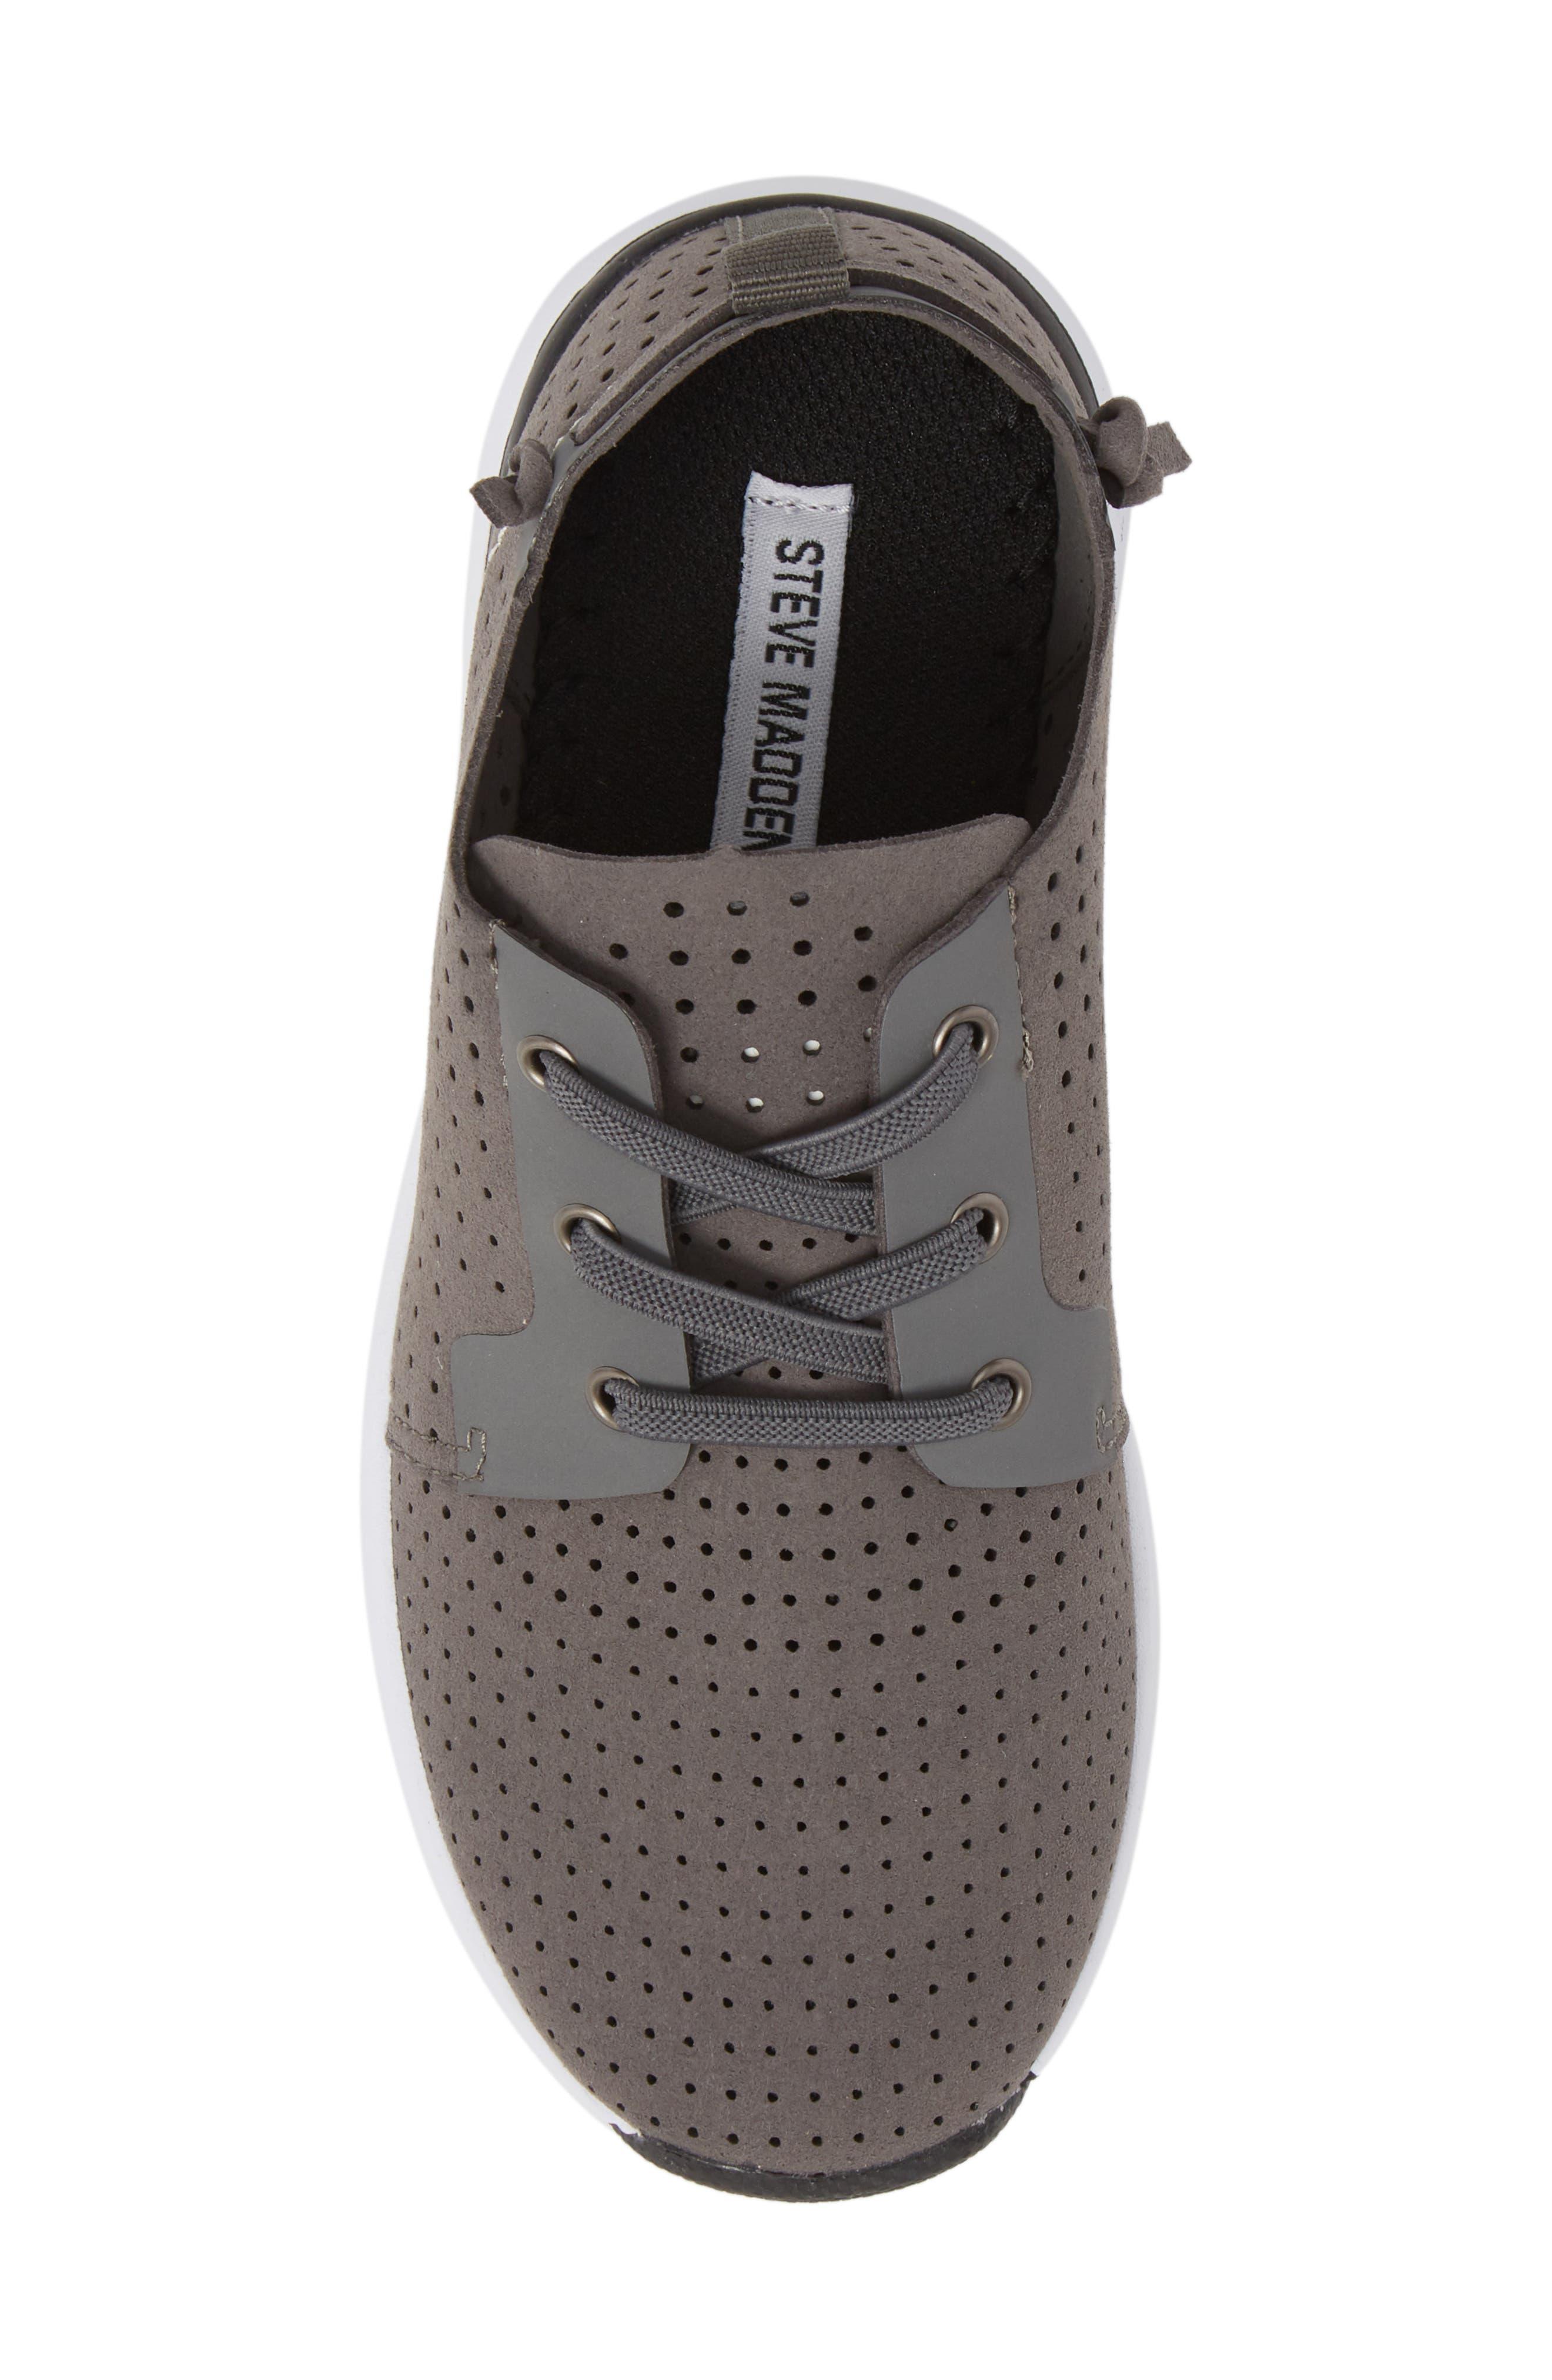 Brixxon Perforated Sneaker,                             Alternate thumbnail 5, color,                             Grey